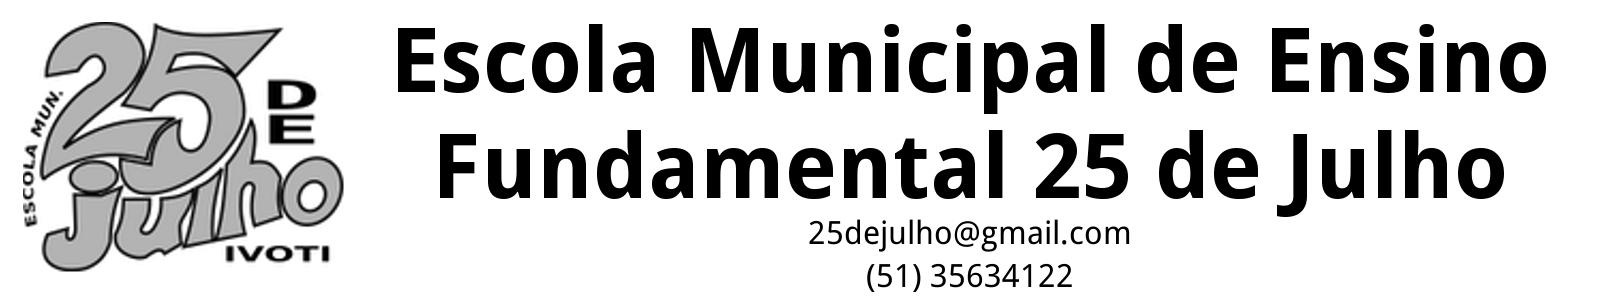 Escola Municipal de Ensino Fundamental 25 de Julho